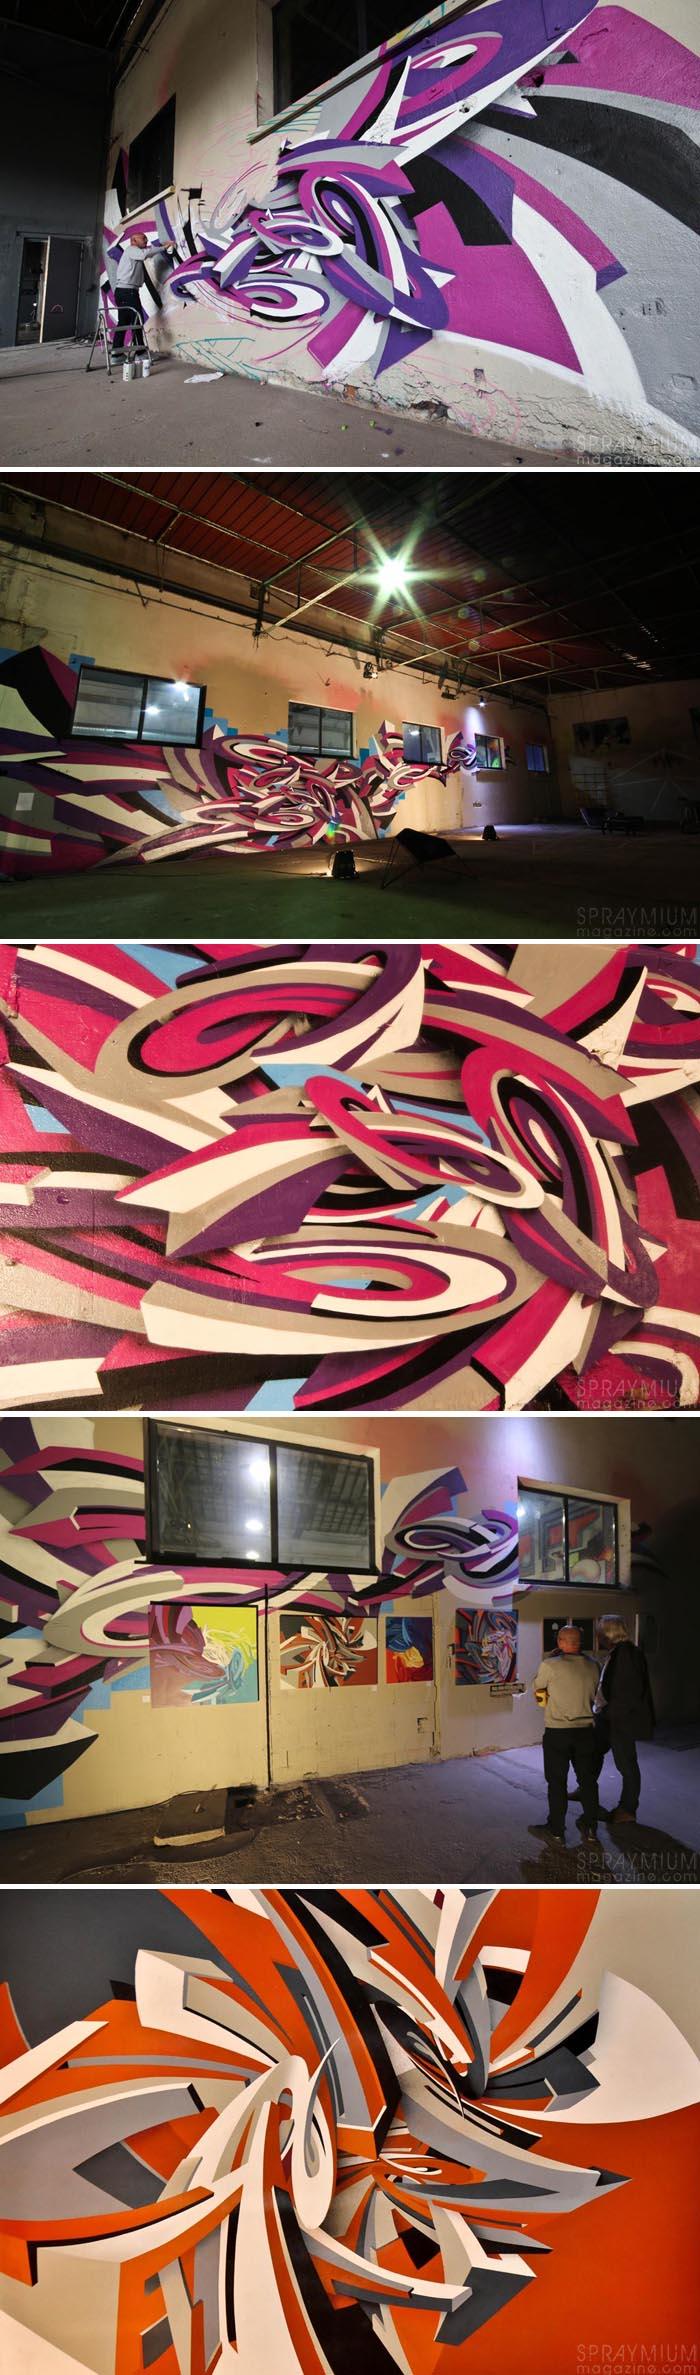 exposition mister freeze toulouse art urbain contemporain graffiti postgraffiti streetart muralism spraymium der